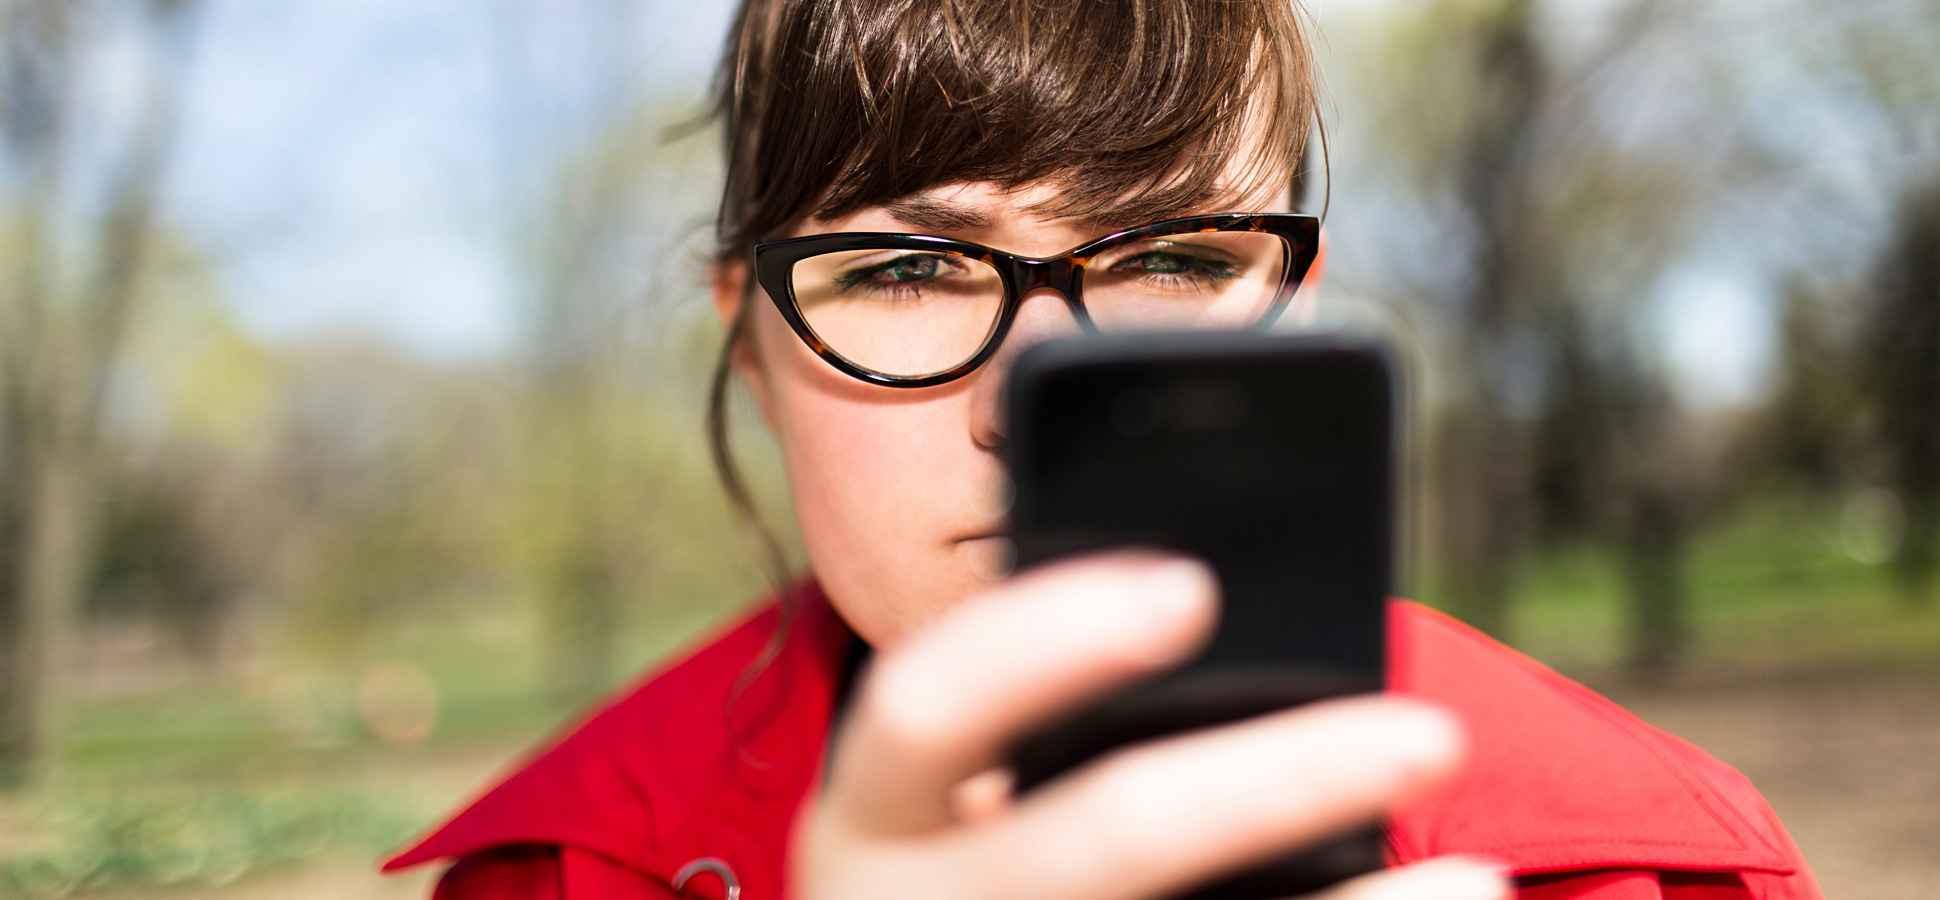 5 Tactics to Make Text Marketing Work | Inc com